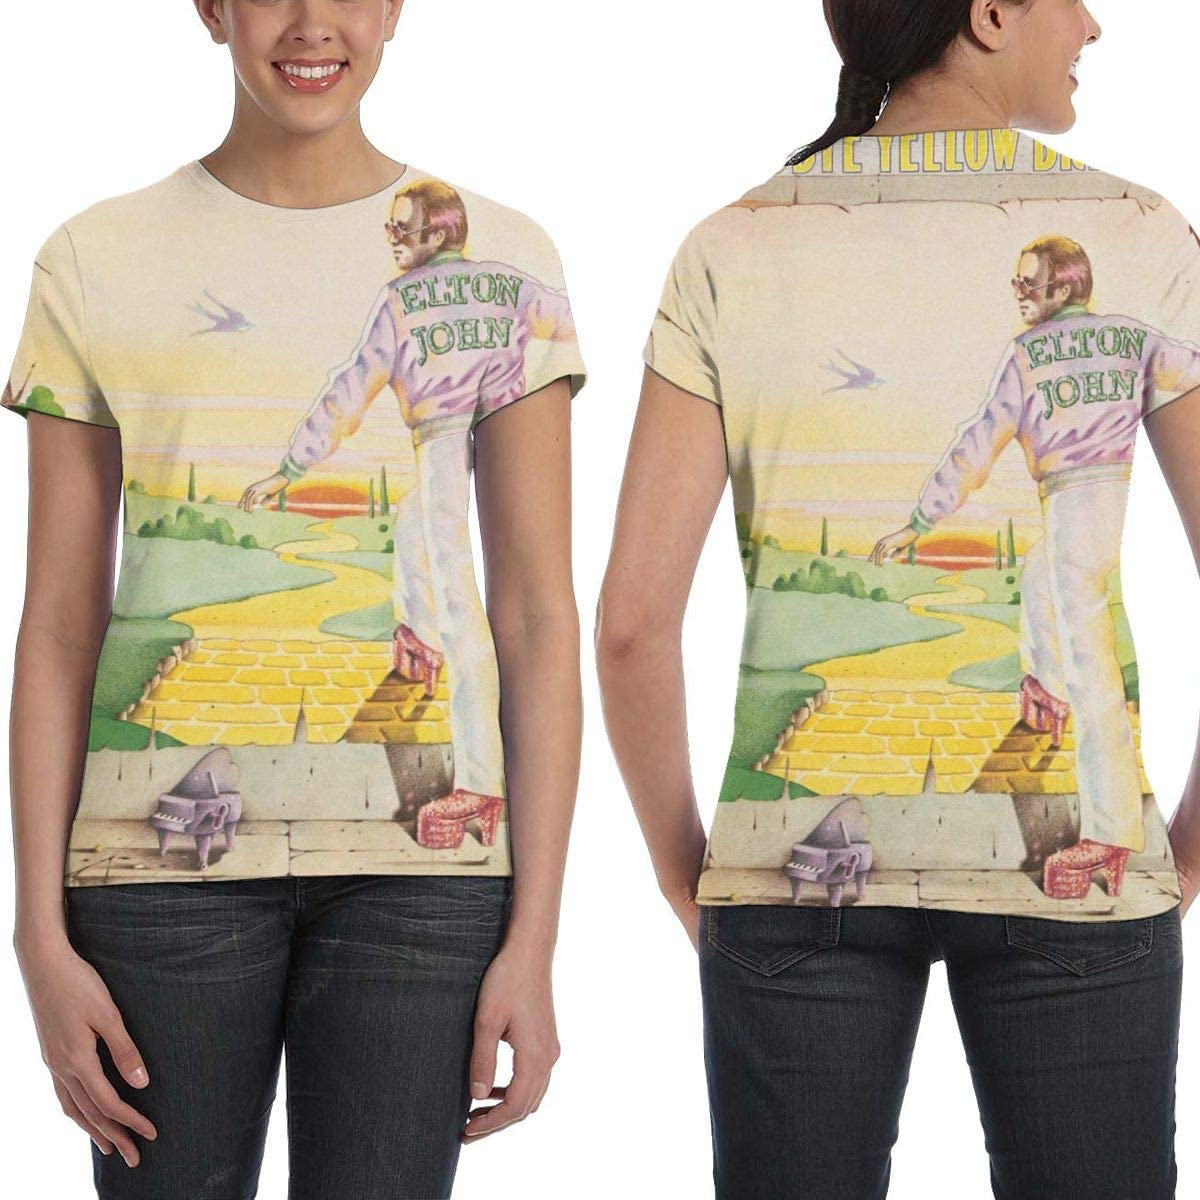 NancyA Womens Elton John Goodbye Yellow Brick Road Design 3D Printed Short Sleeve T-Shirt Black